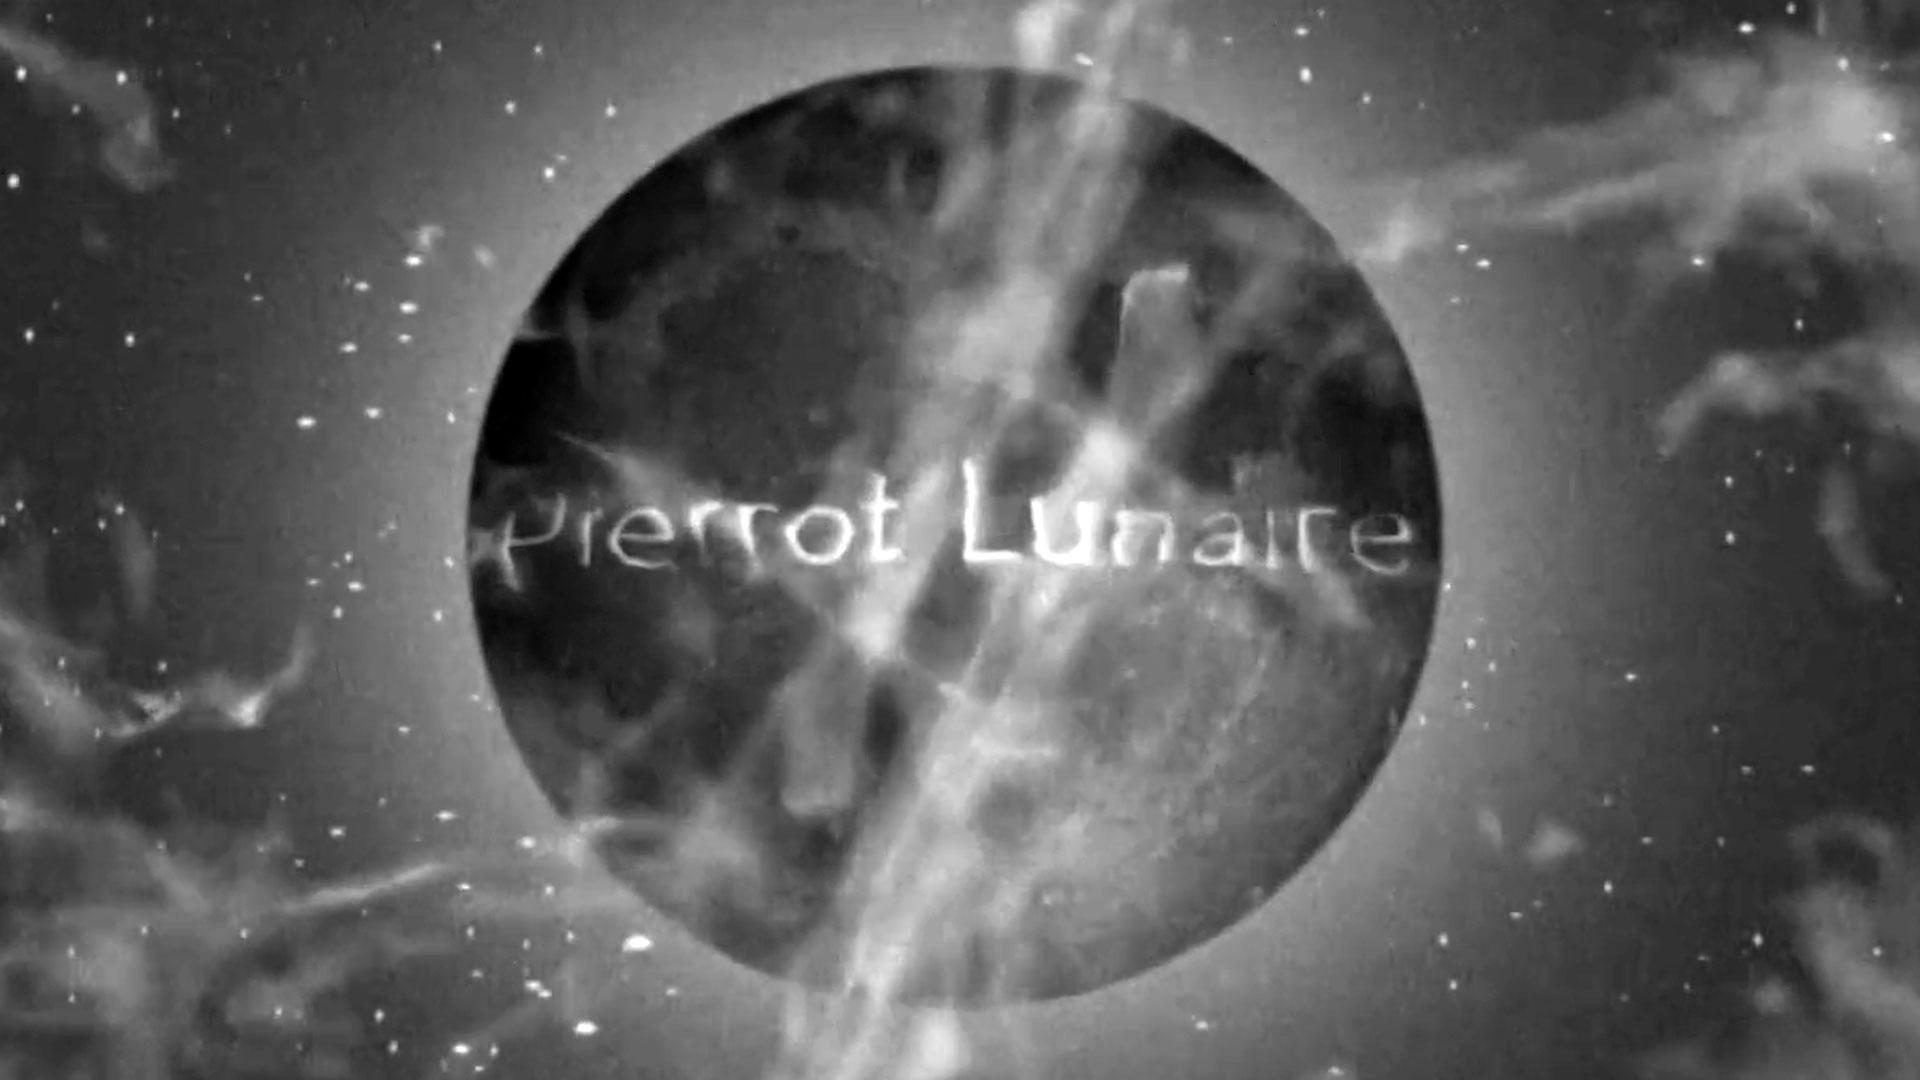 Pierrot Lunaire CETC Teatro Colón